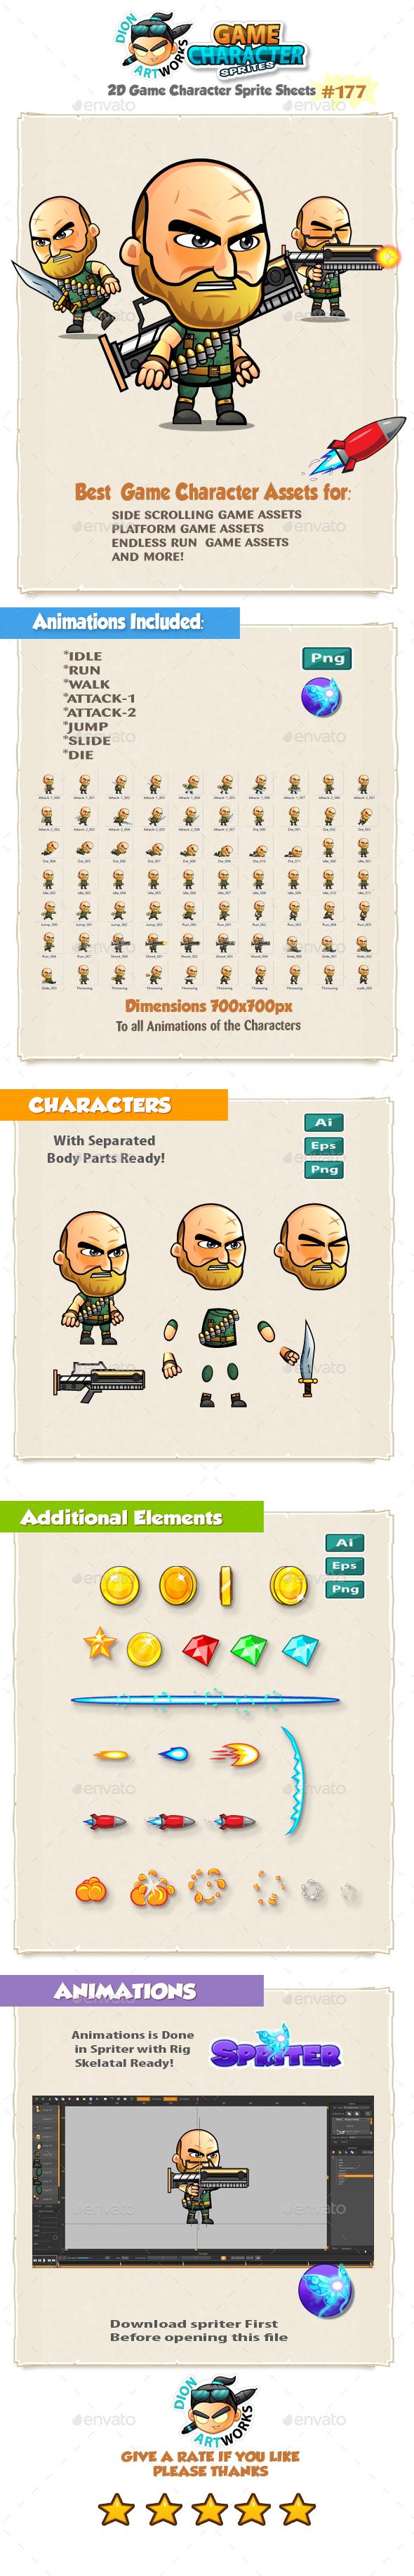 The Big Guy Warrior 2D Game Character Sprites 176 - Sprites Game Assets